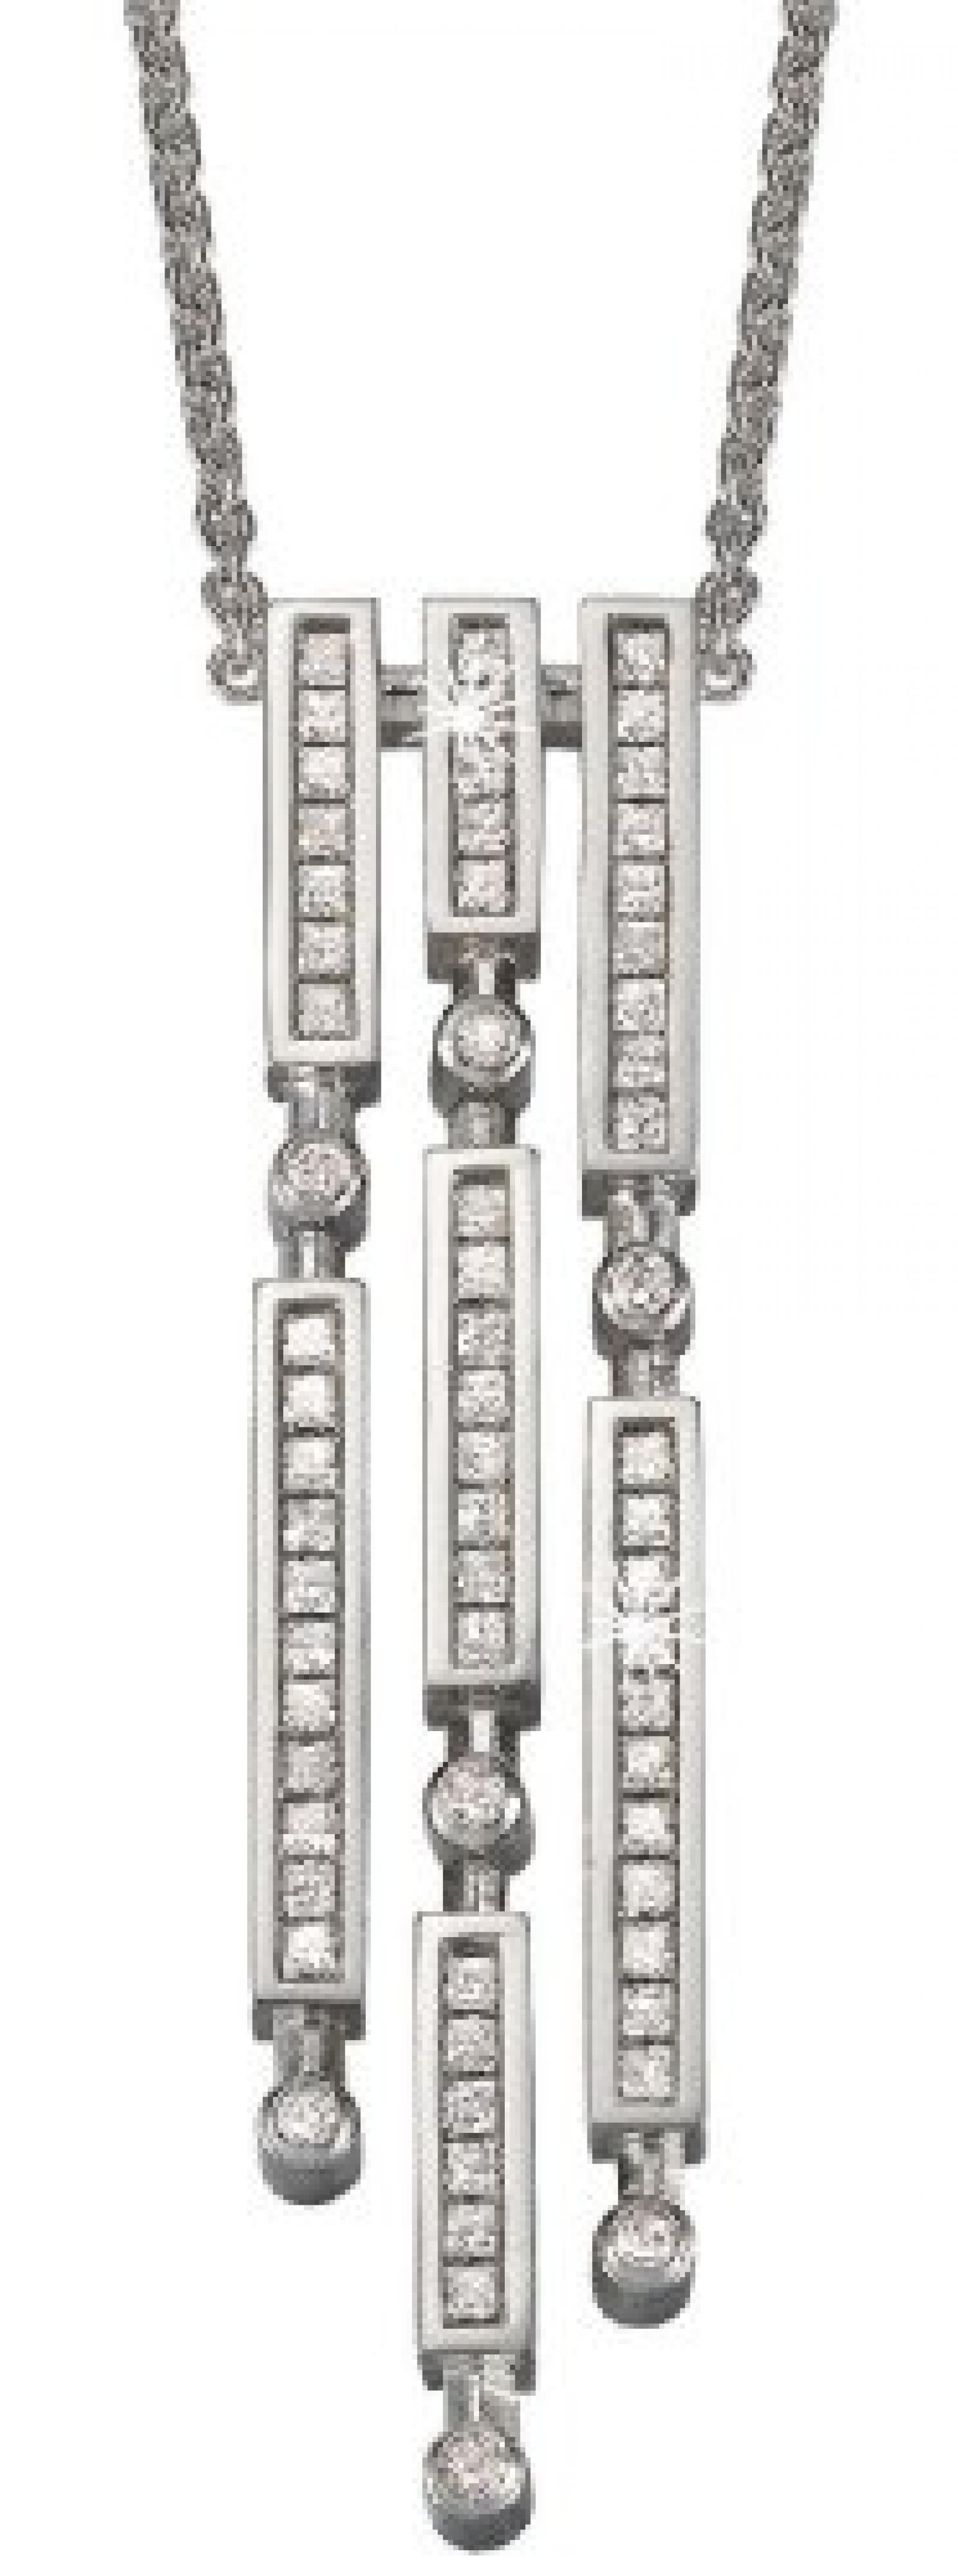 Pierre Cardin Damen Halskette 925 Sterling Silber rhodiniert Kristall Zirkonia Cascade 42 cm weiß PCNL90385A420